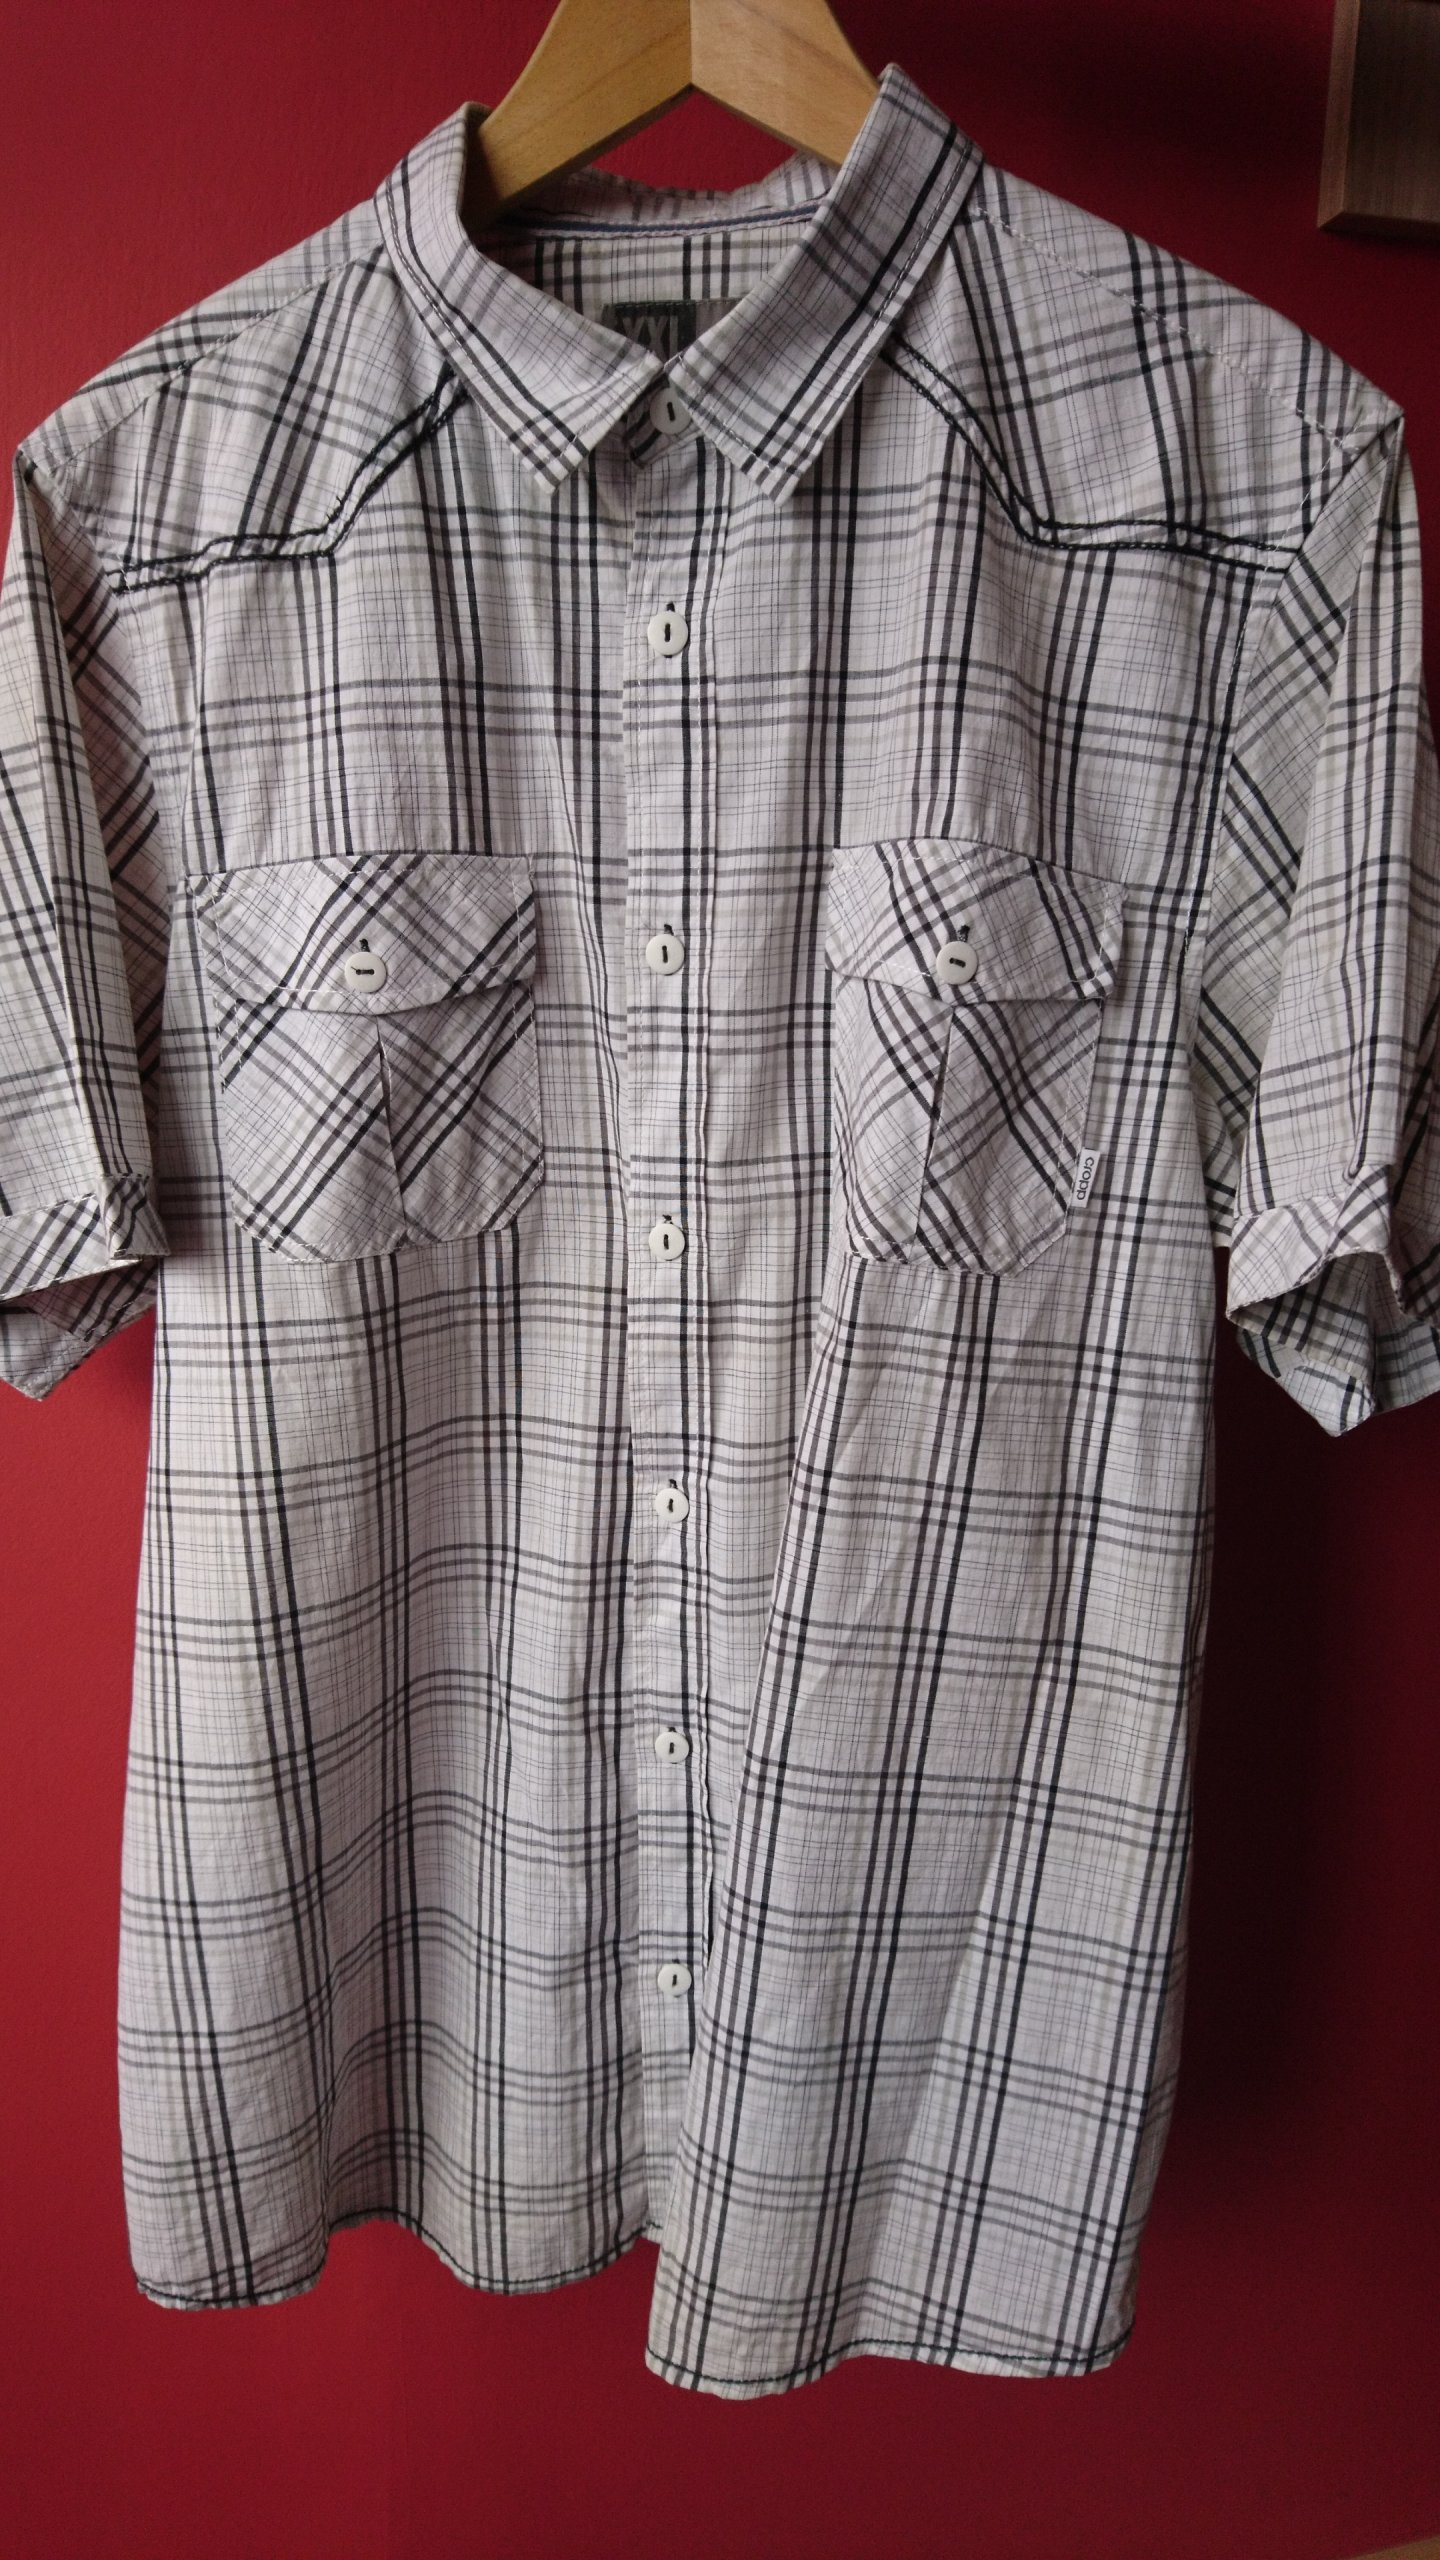 146c9f6fc1bedb Koszula męska CROPP XXL krótki rękaw, 100% bawełna - 7211604837 ...